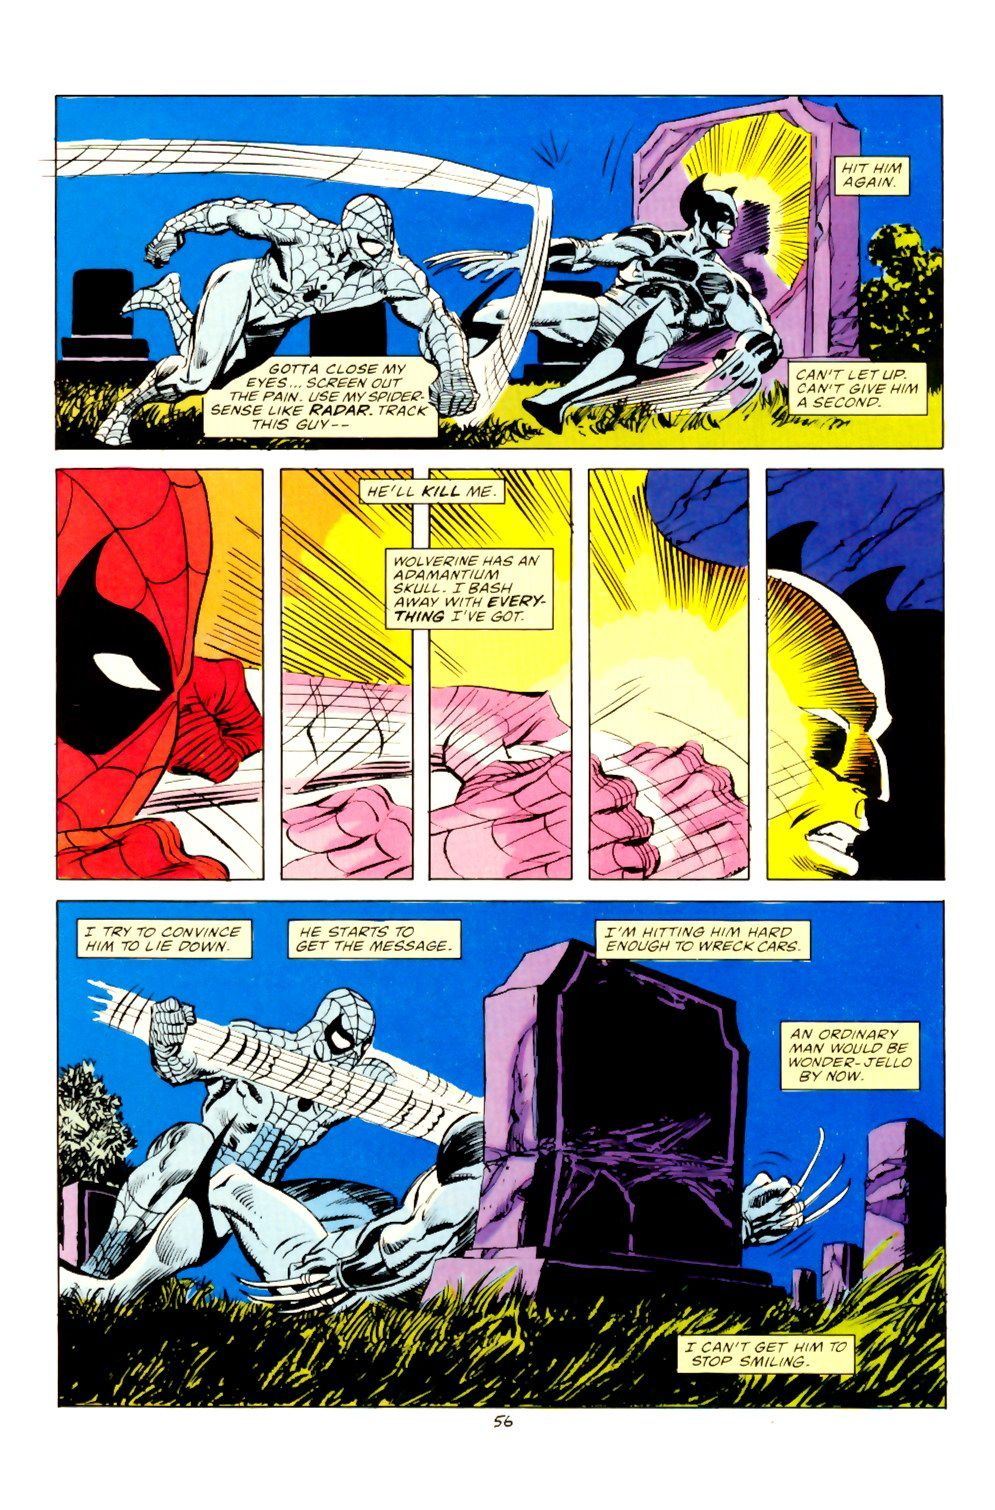 Spider-man VS Wolverine | Panels and a splash of color | Pinterest